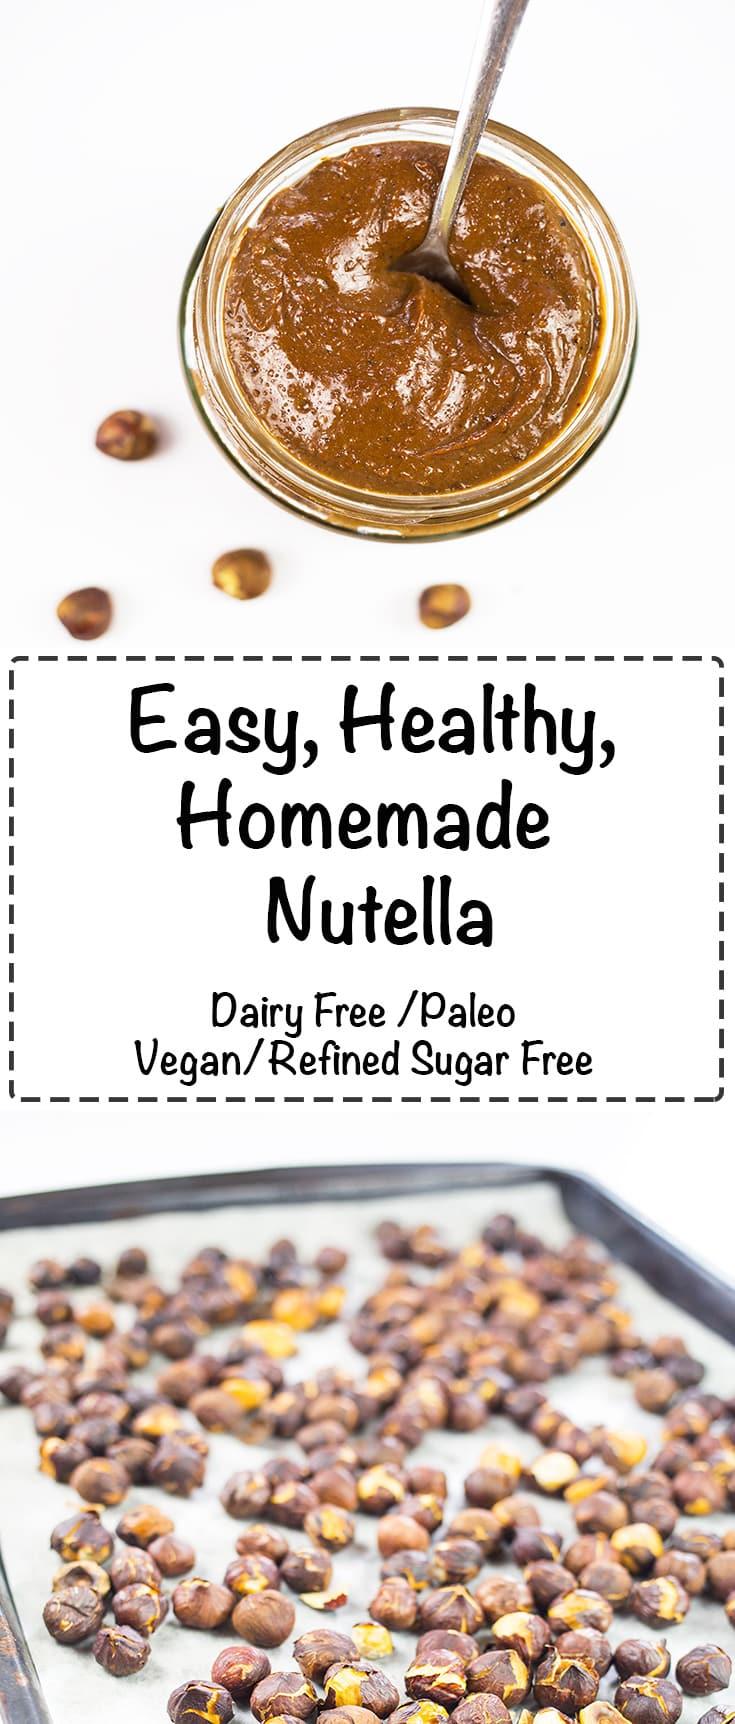 Homemade Nutella - Easy, Healthy and Tasty! #paleo #vegan #dairyfree #nutella #refinedsugarfree #chocolate